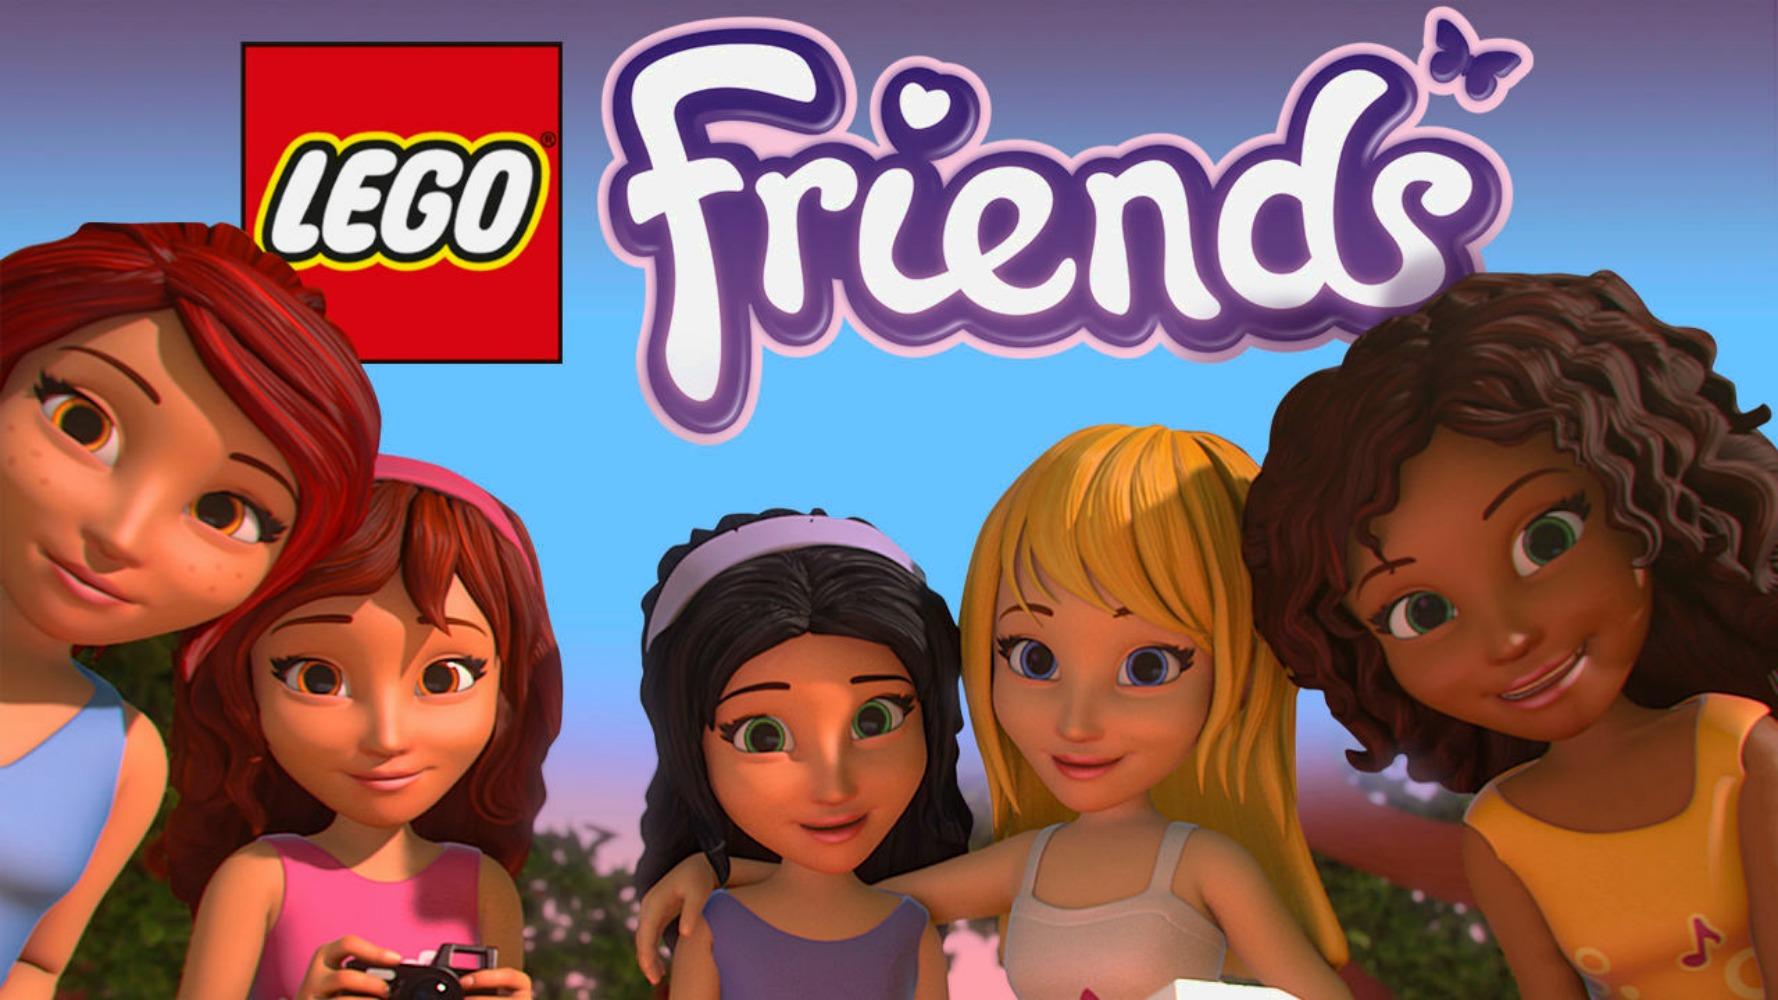 Lego Friends final